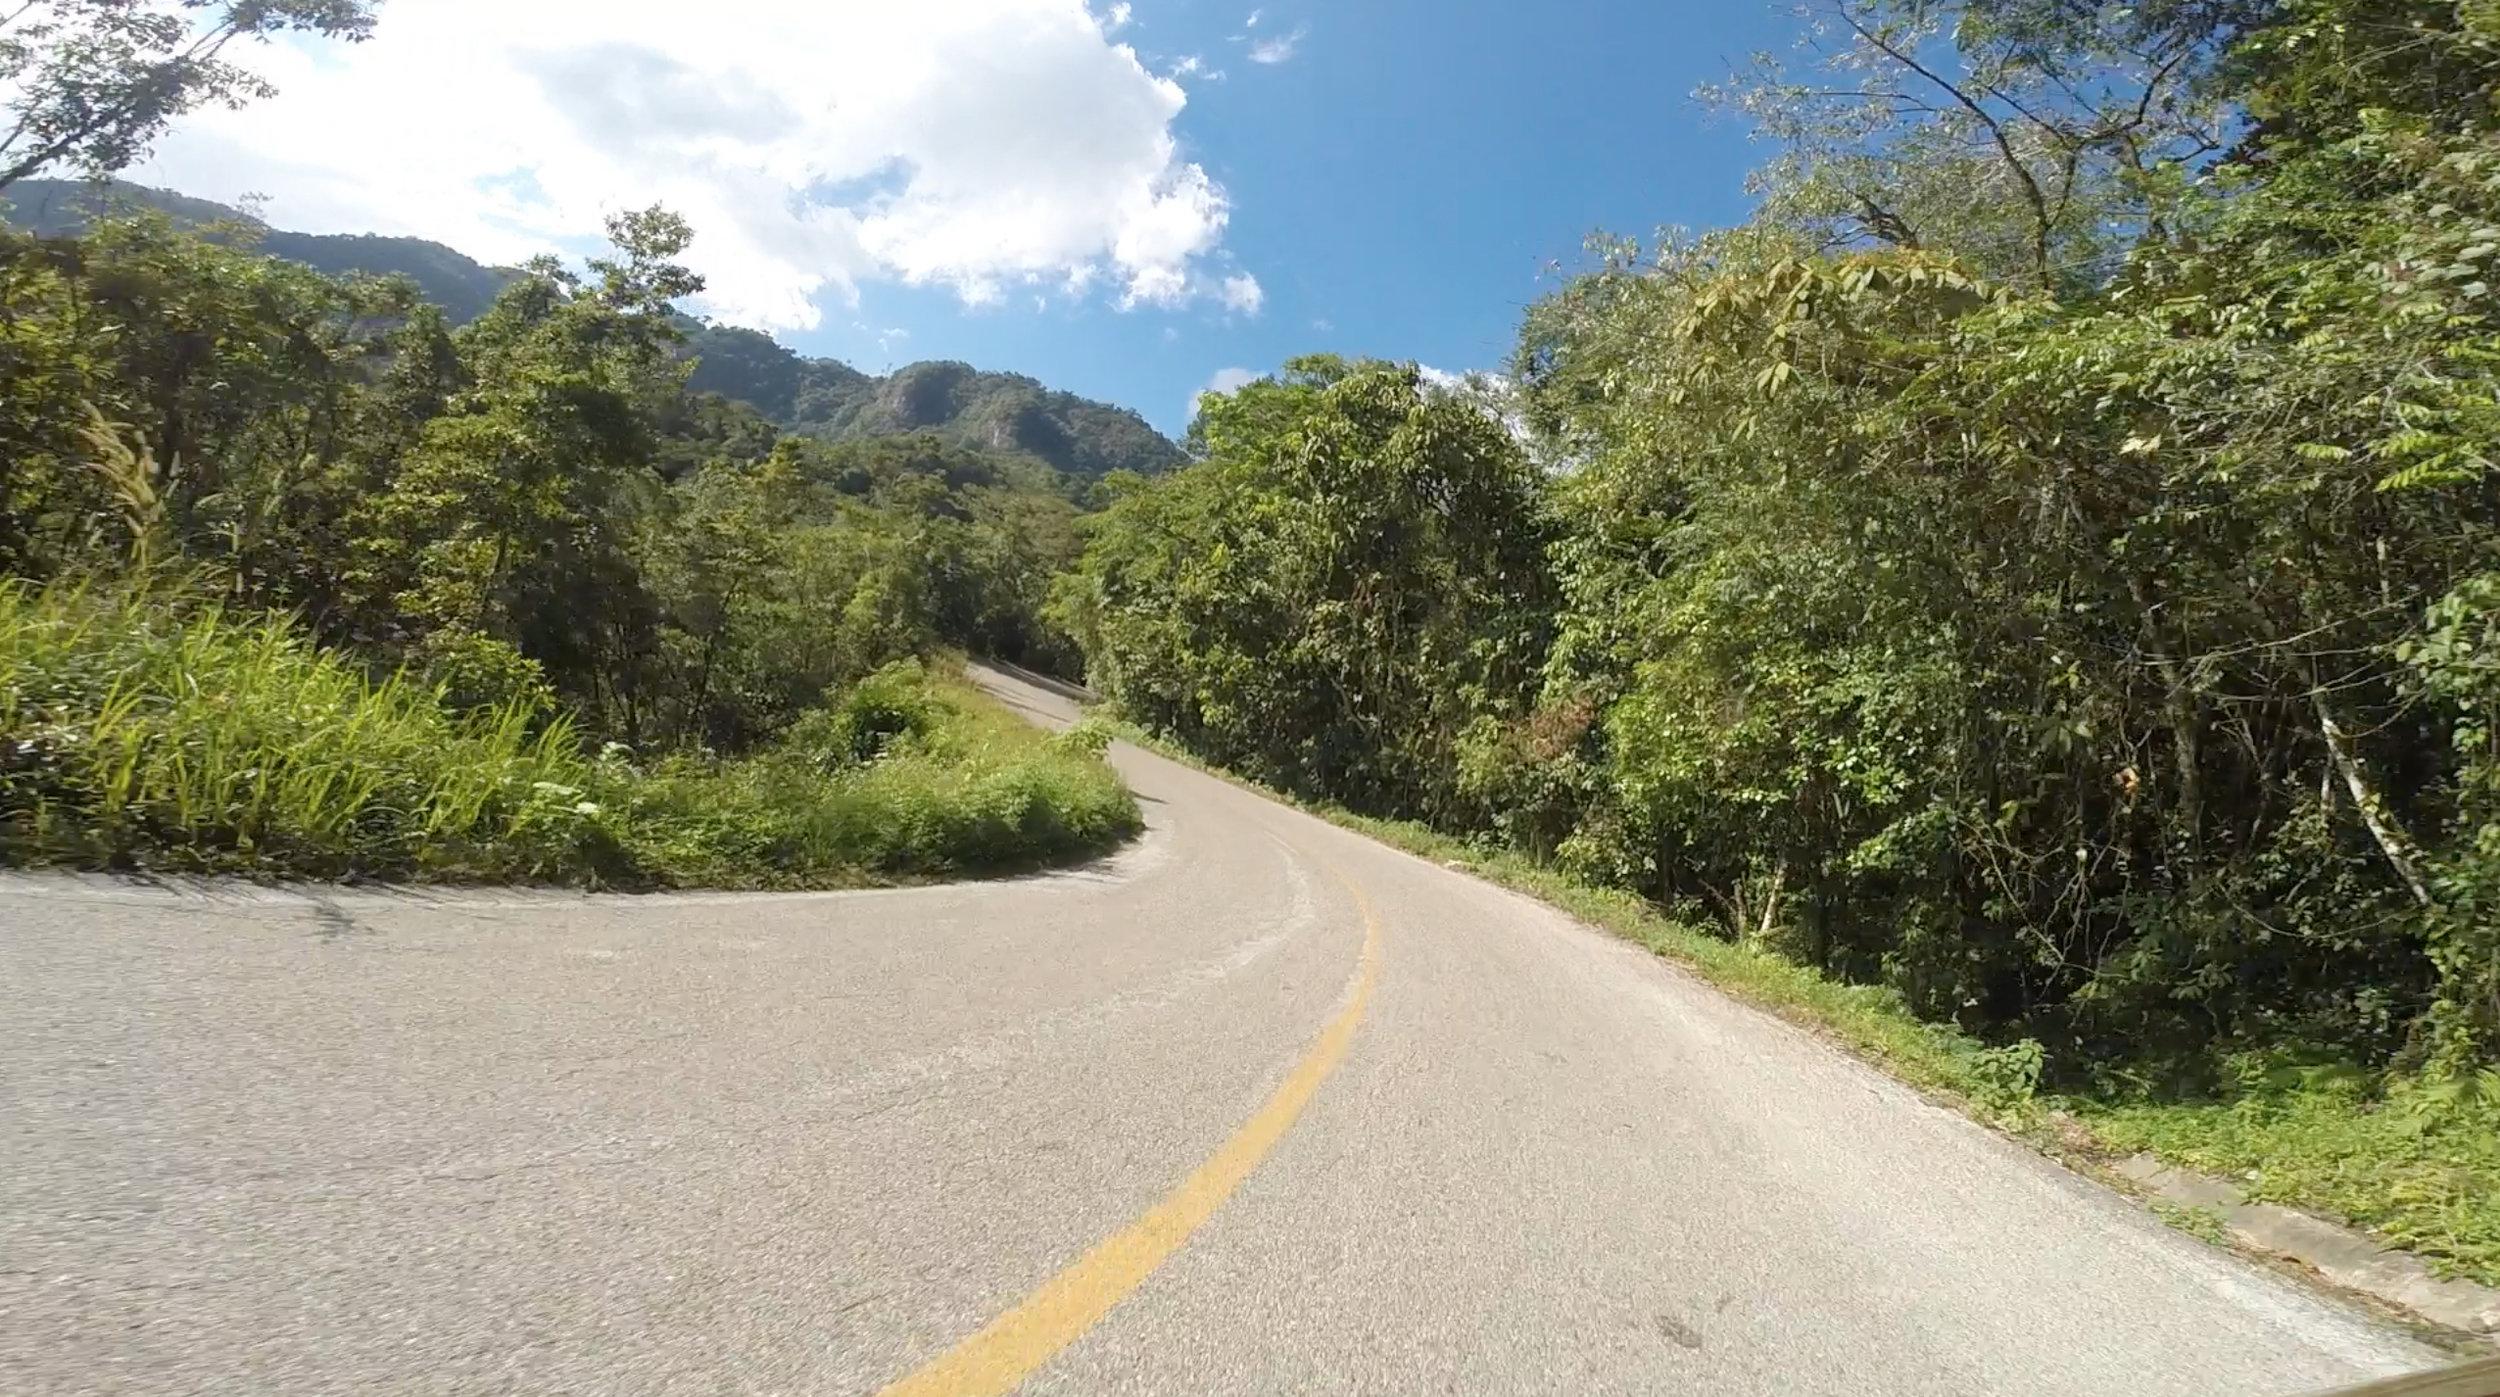 Into Chiapas